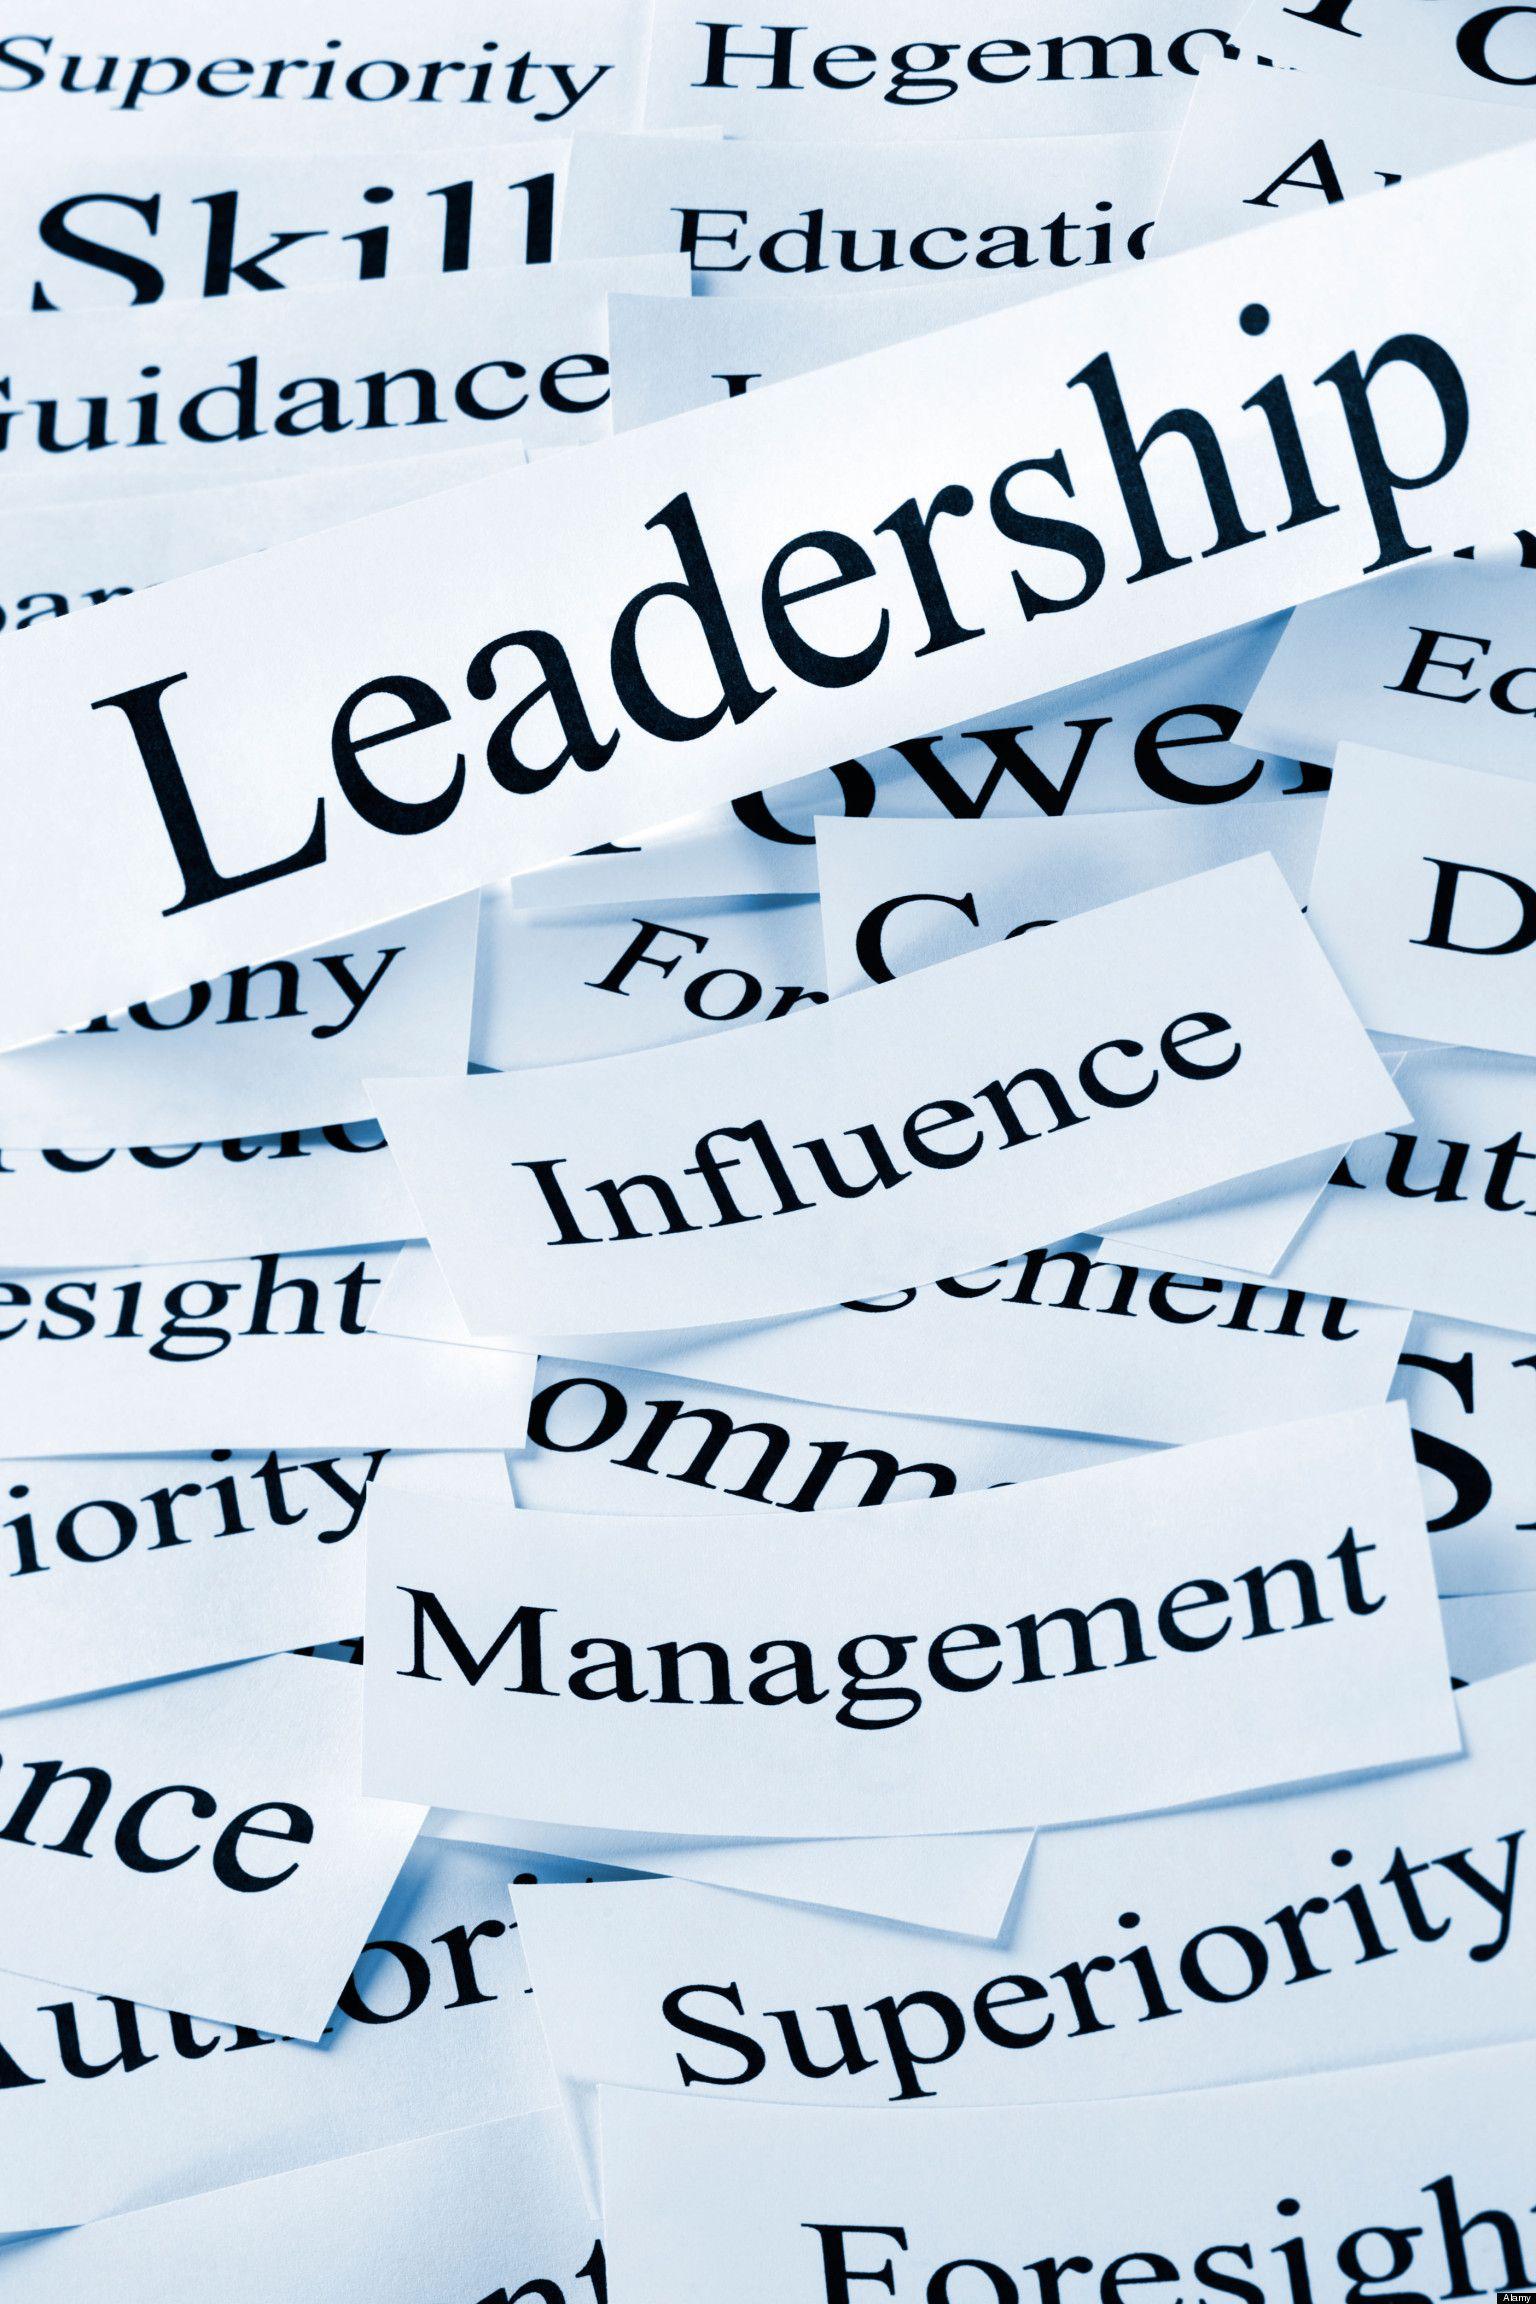 Alfred Mann Foundation Gala Famous Leadership Quotes Leadership Quotes Leadership